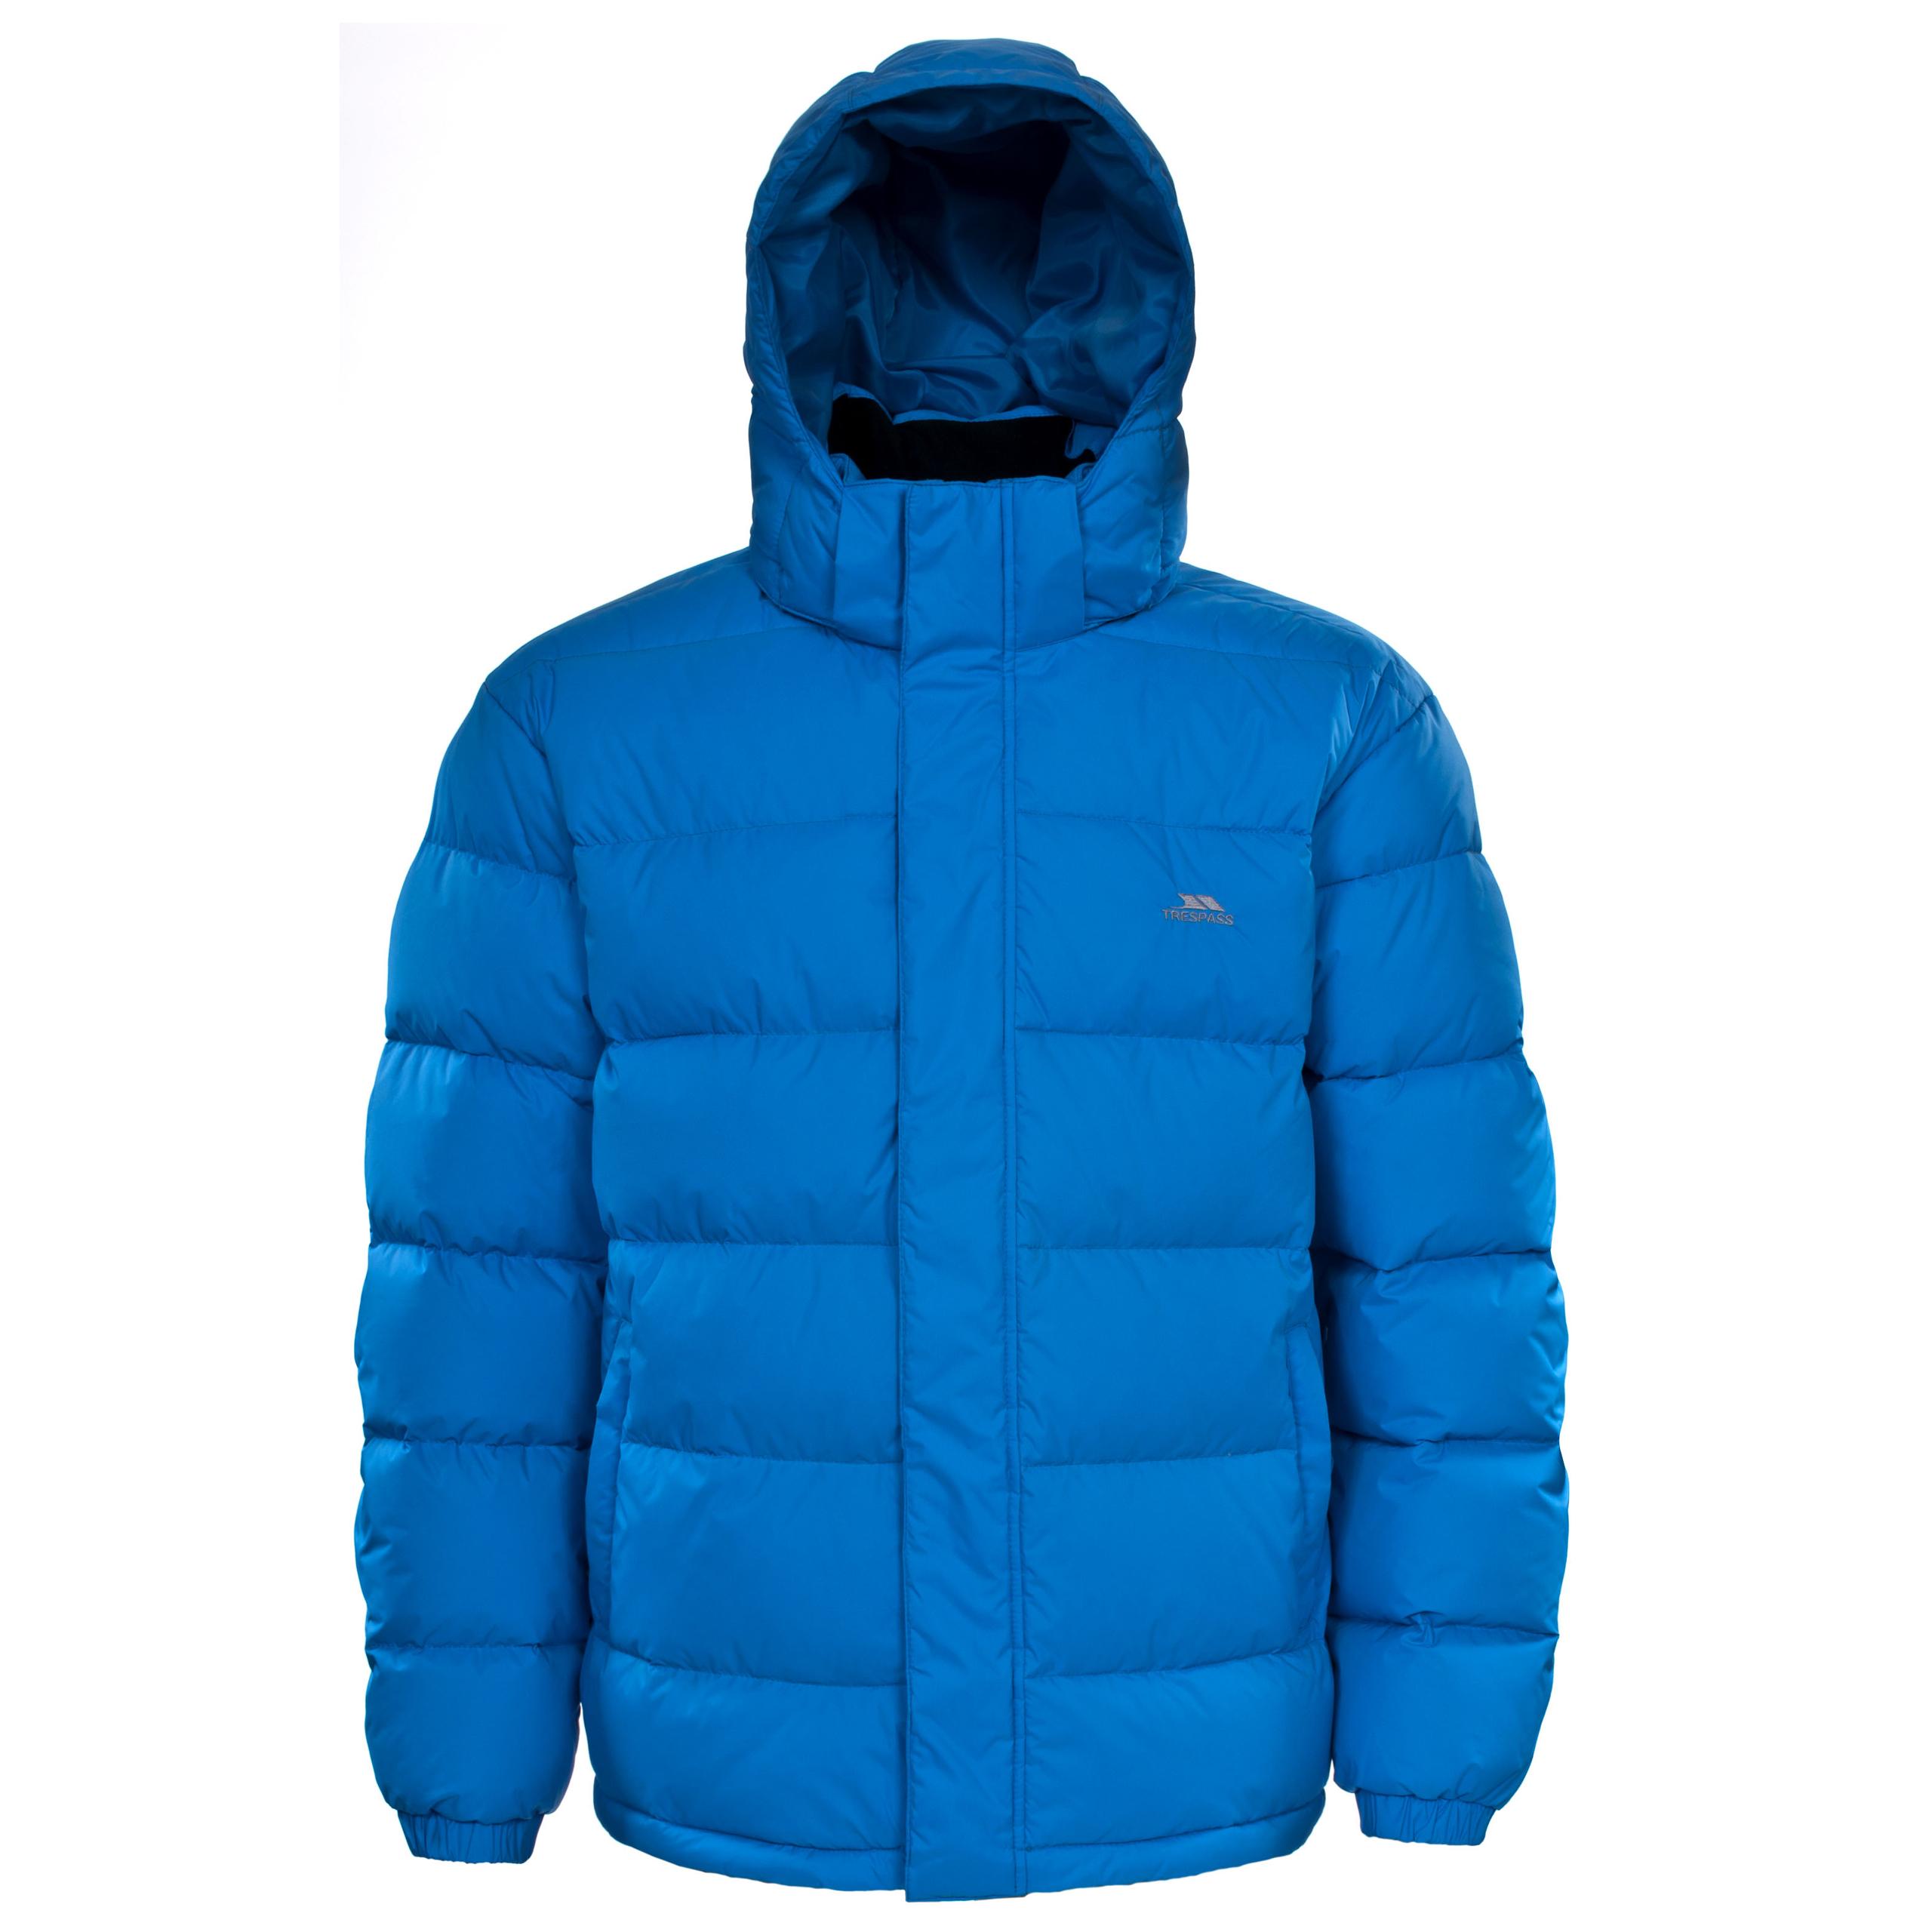 Trespass SYRUS Hooded Winter Down Coat Waterproof Jacket